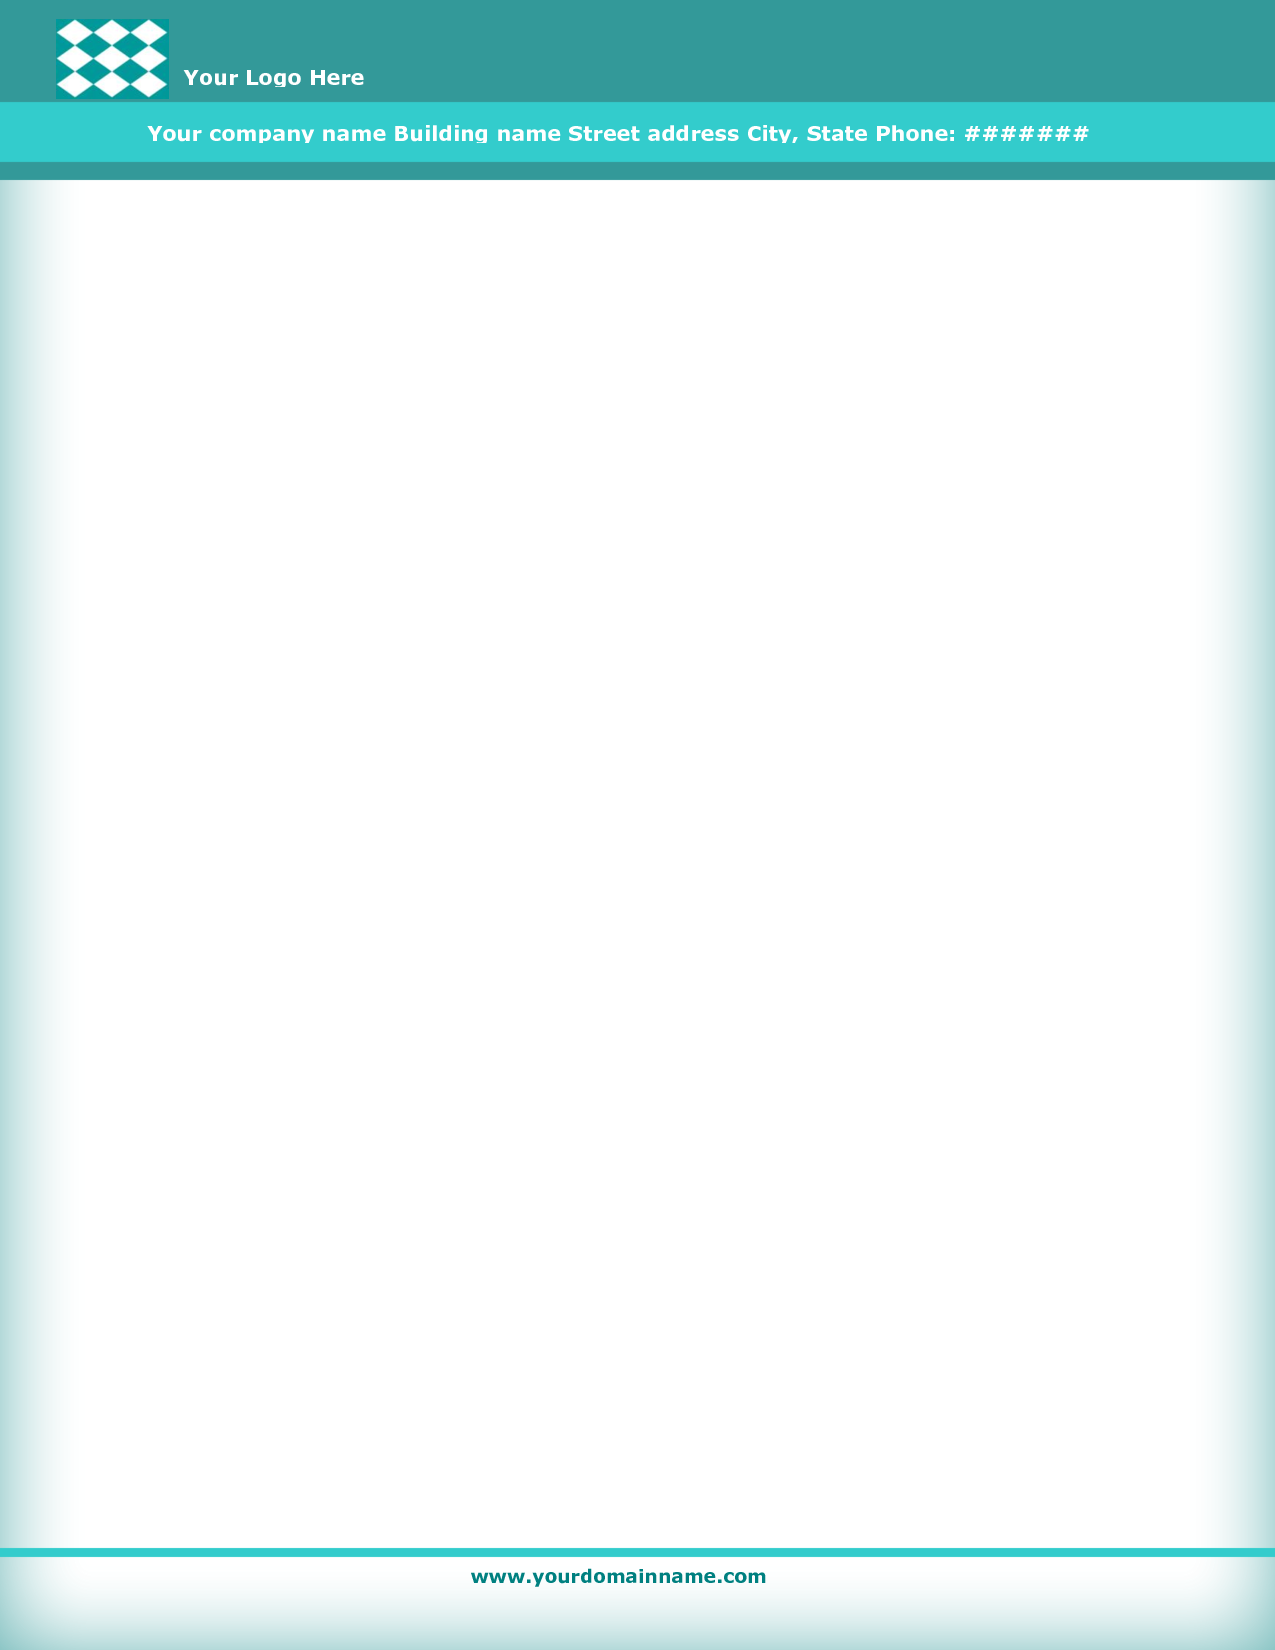 Business Letterhead Templates Free Download Jjj Pinterest